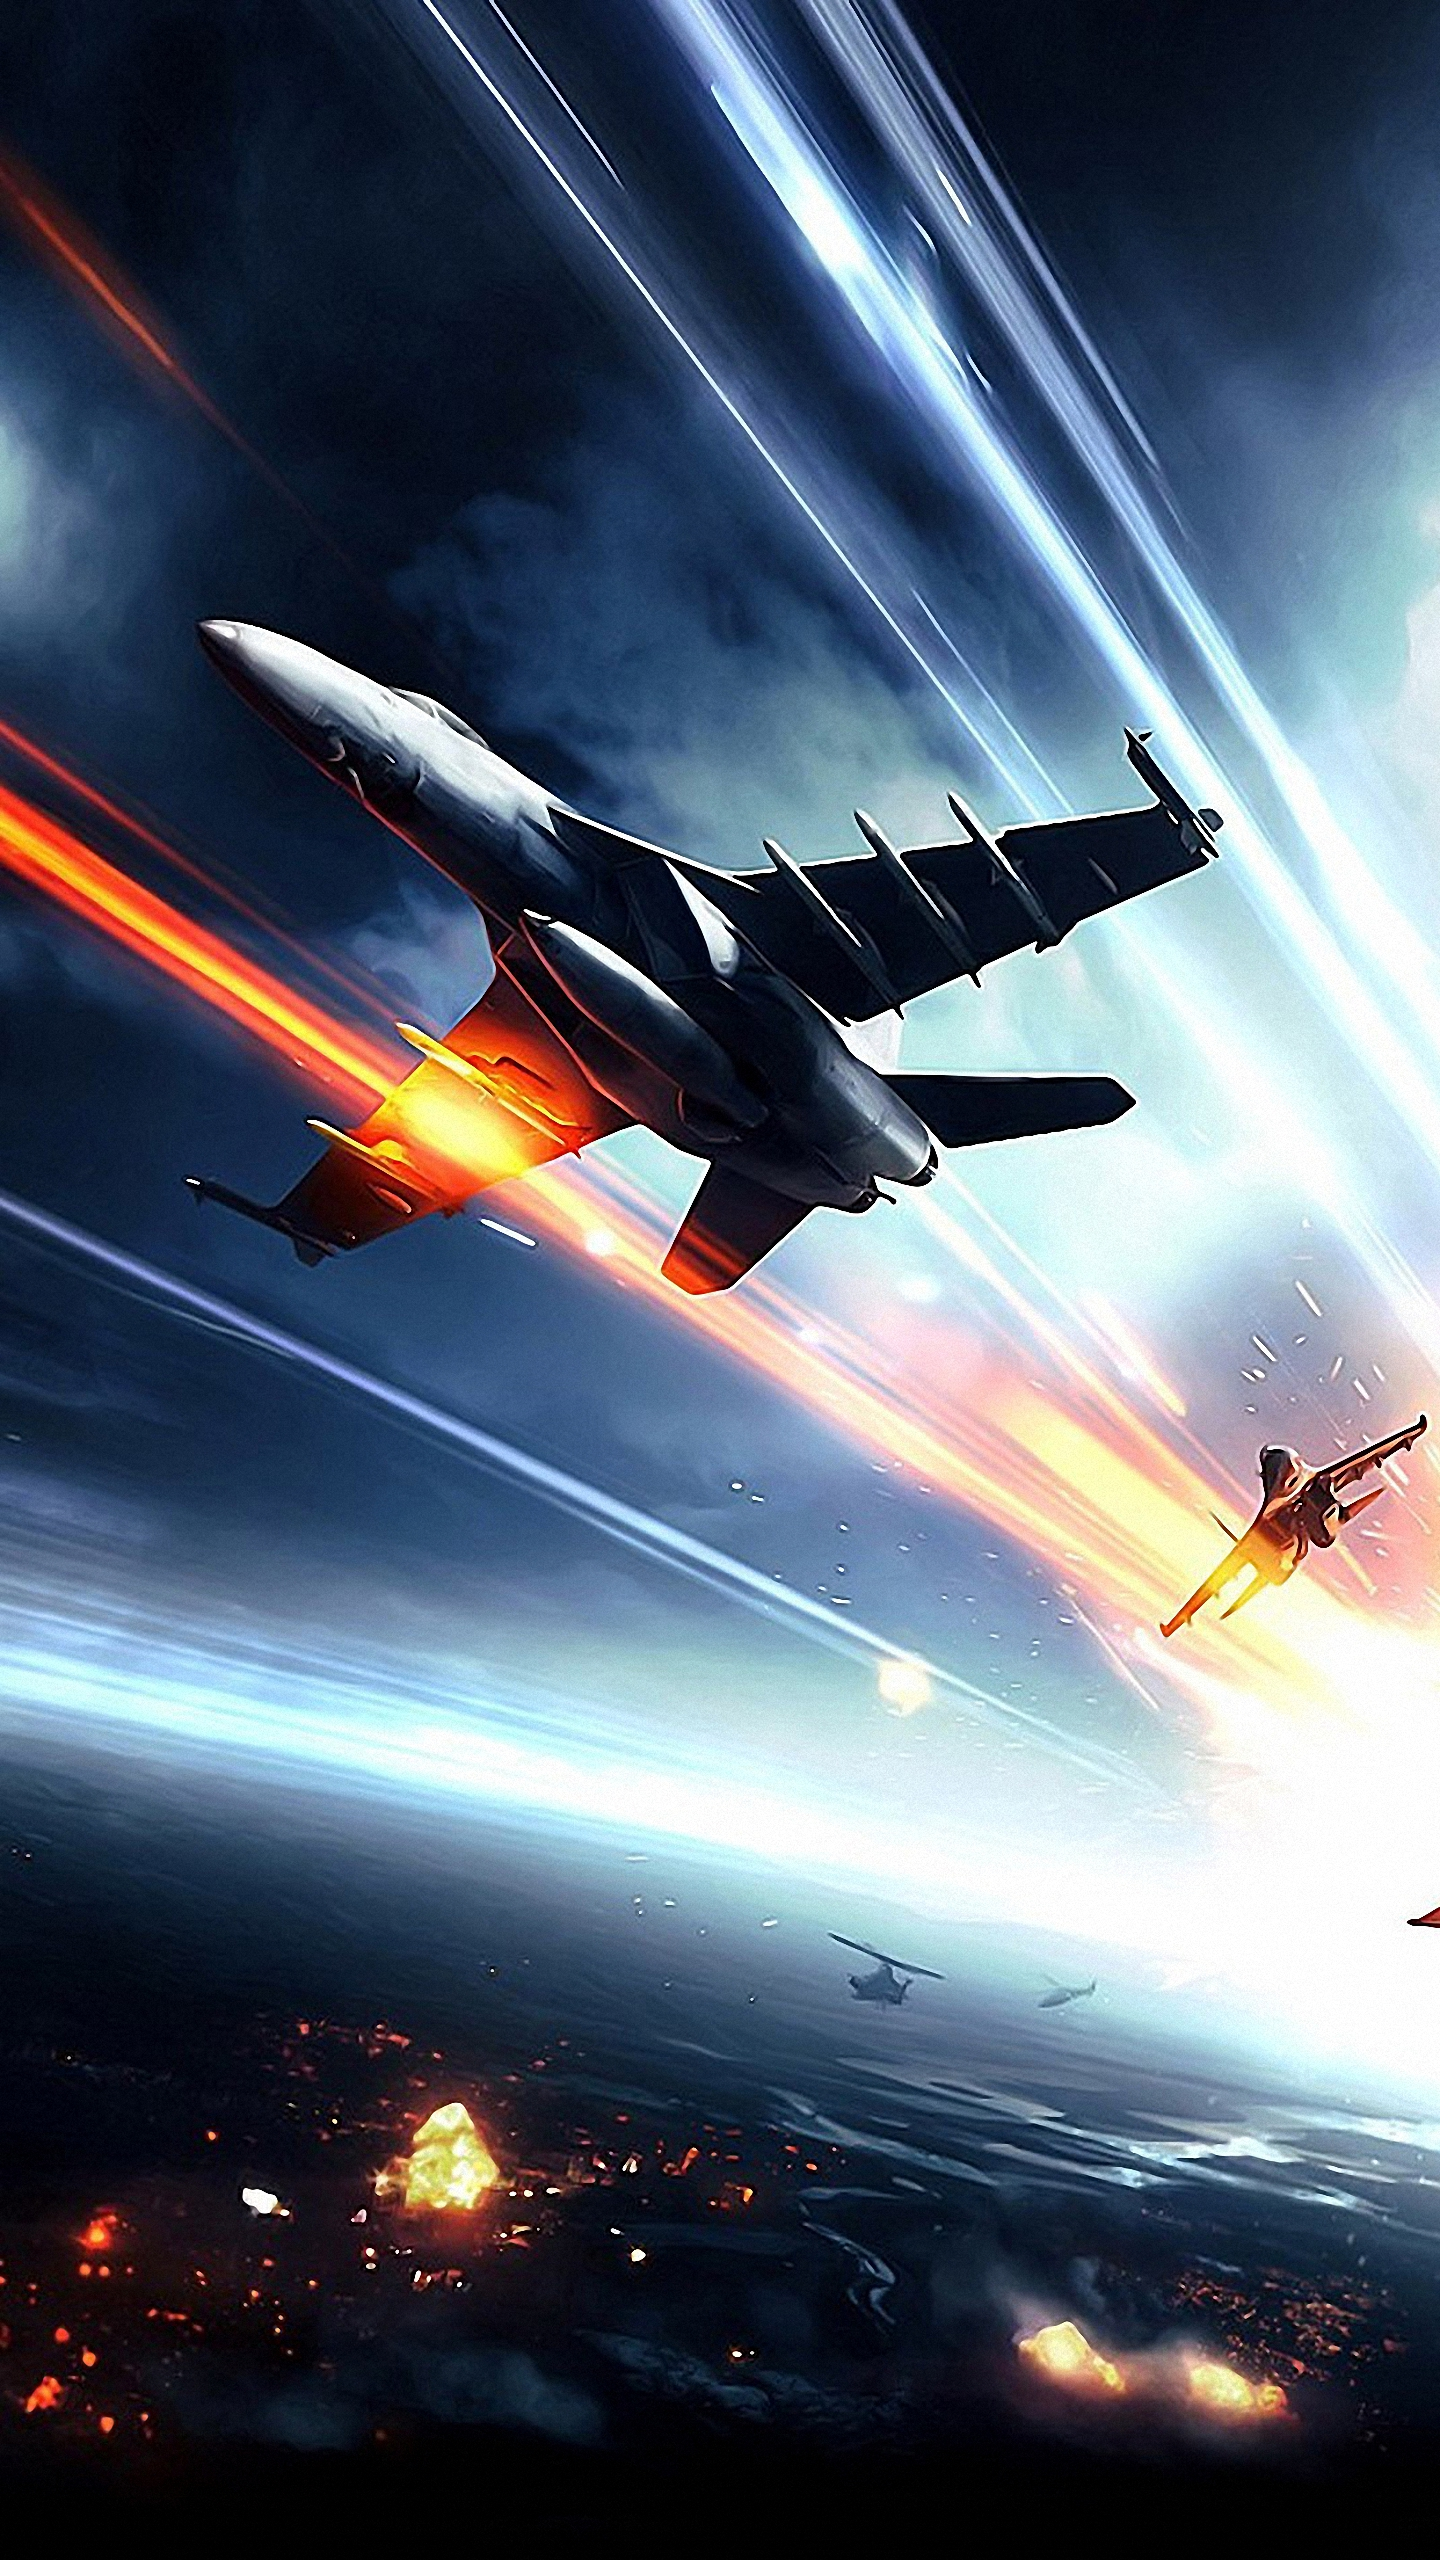 Battlefield 3 Games iPhone 6s Wallpapers HD 1440x2560